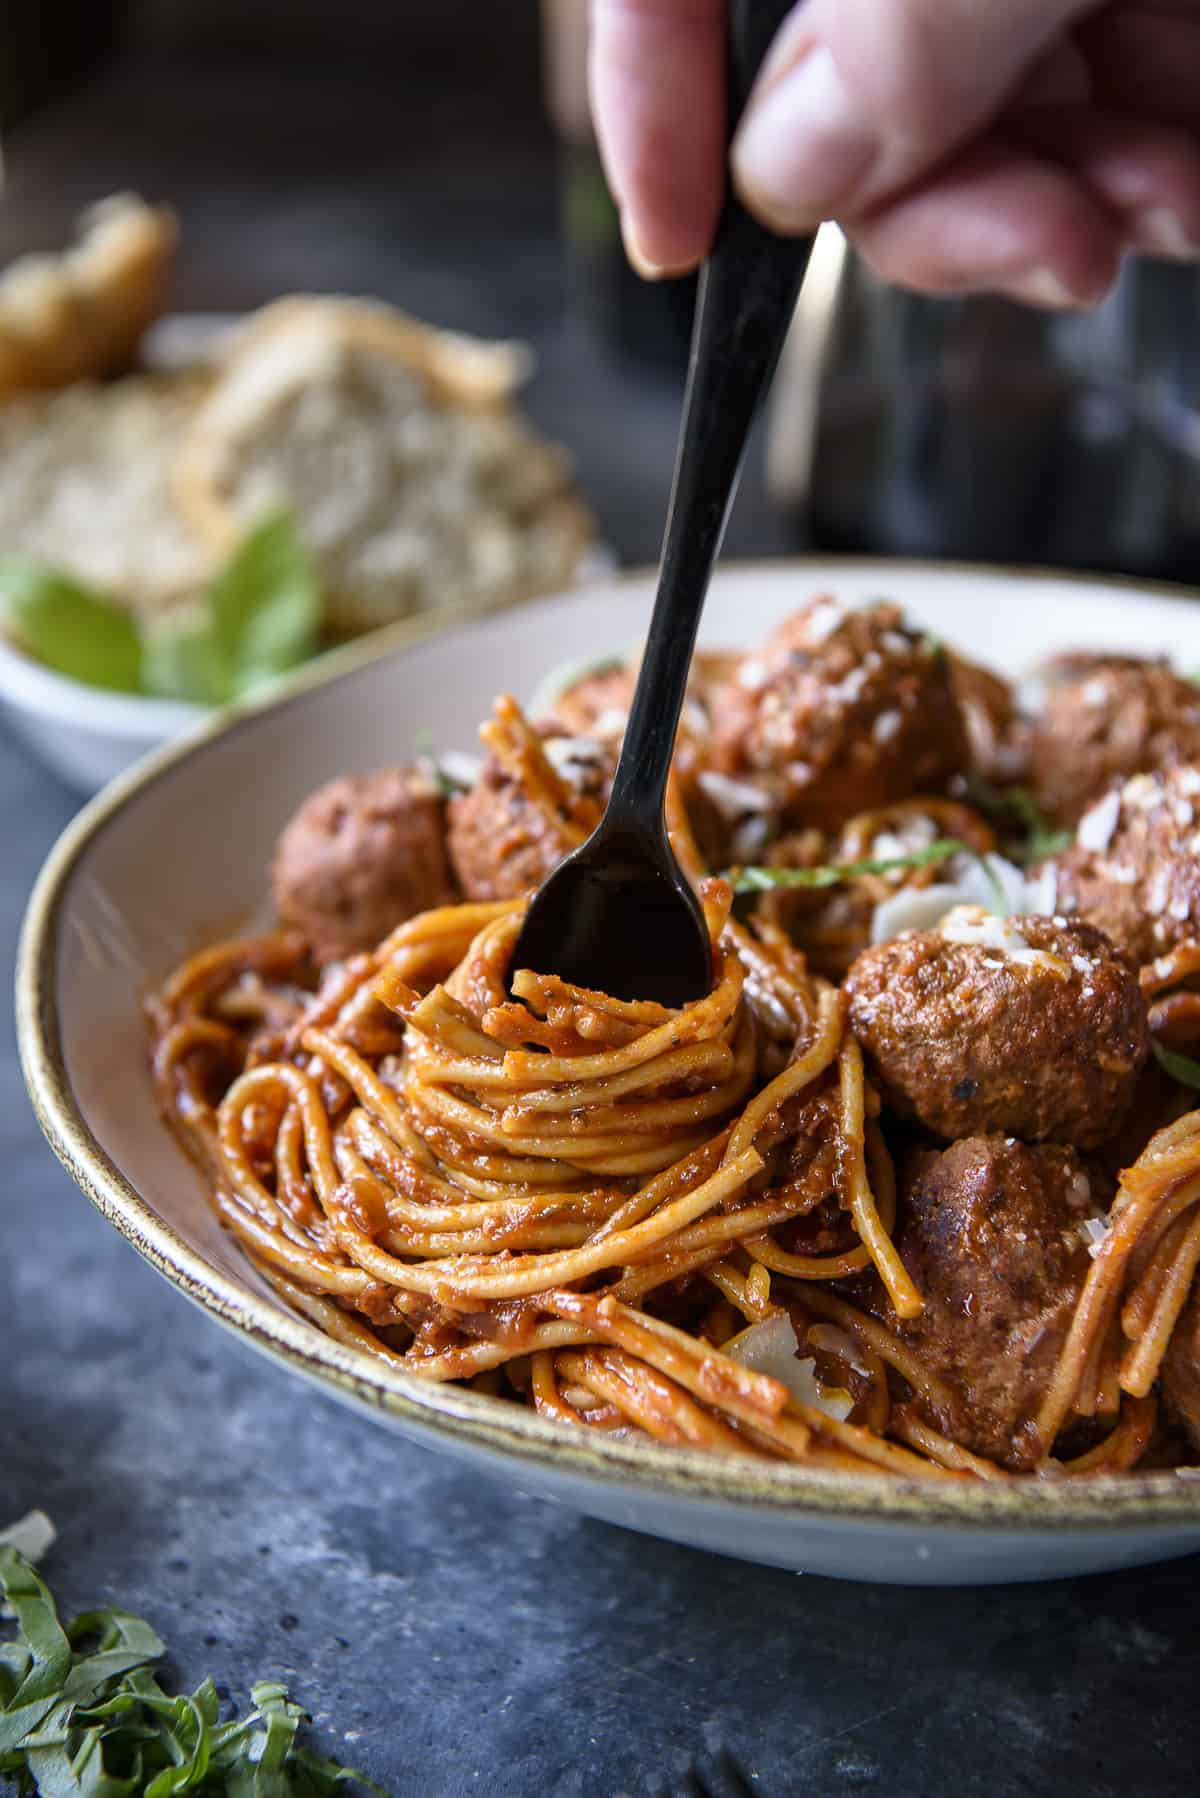 30-Minute Instant Pot Spaghetti and Meatballs